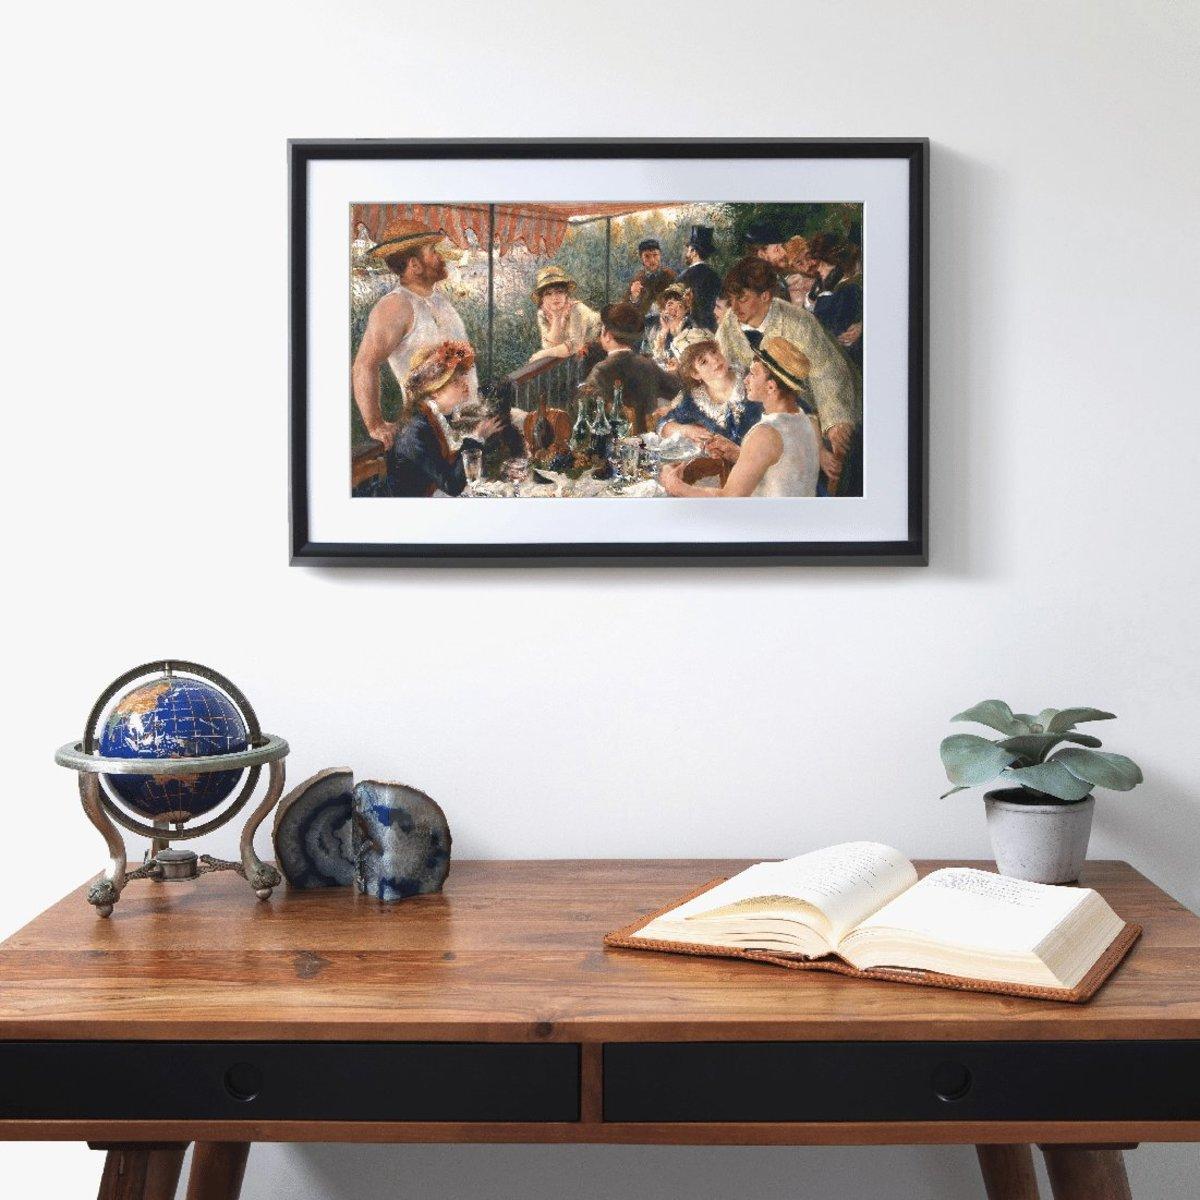 "Meural Canvas – 27"" Smart Digital Frame"